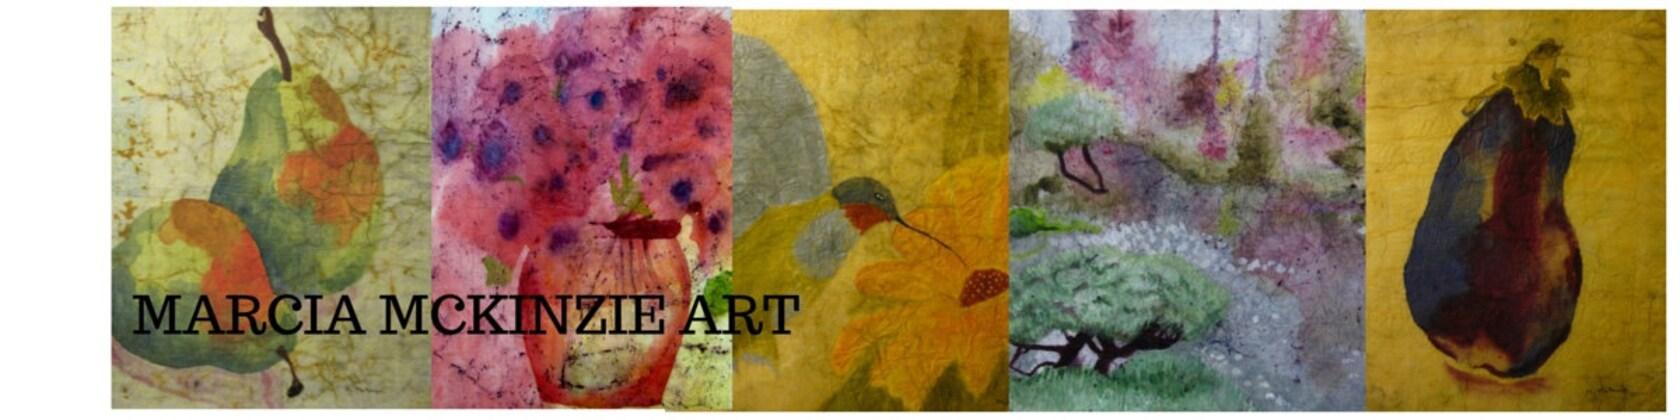 Marcia McKinzie Art Painting Artwork Watercolor Batiks on Rice Paper